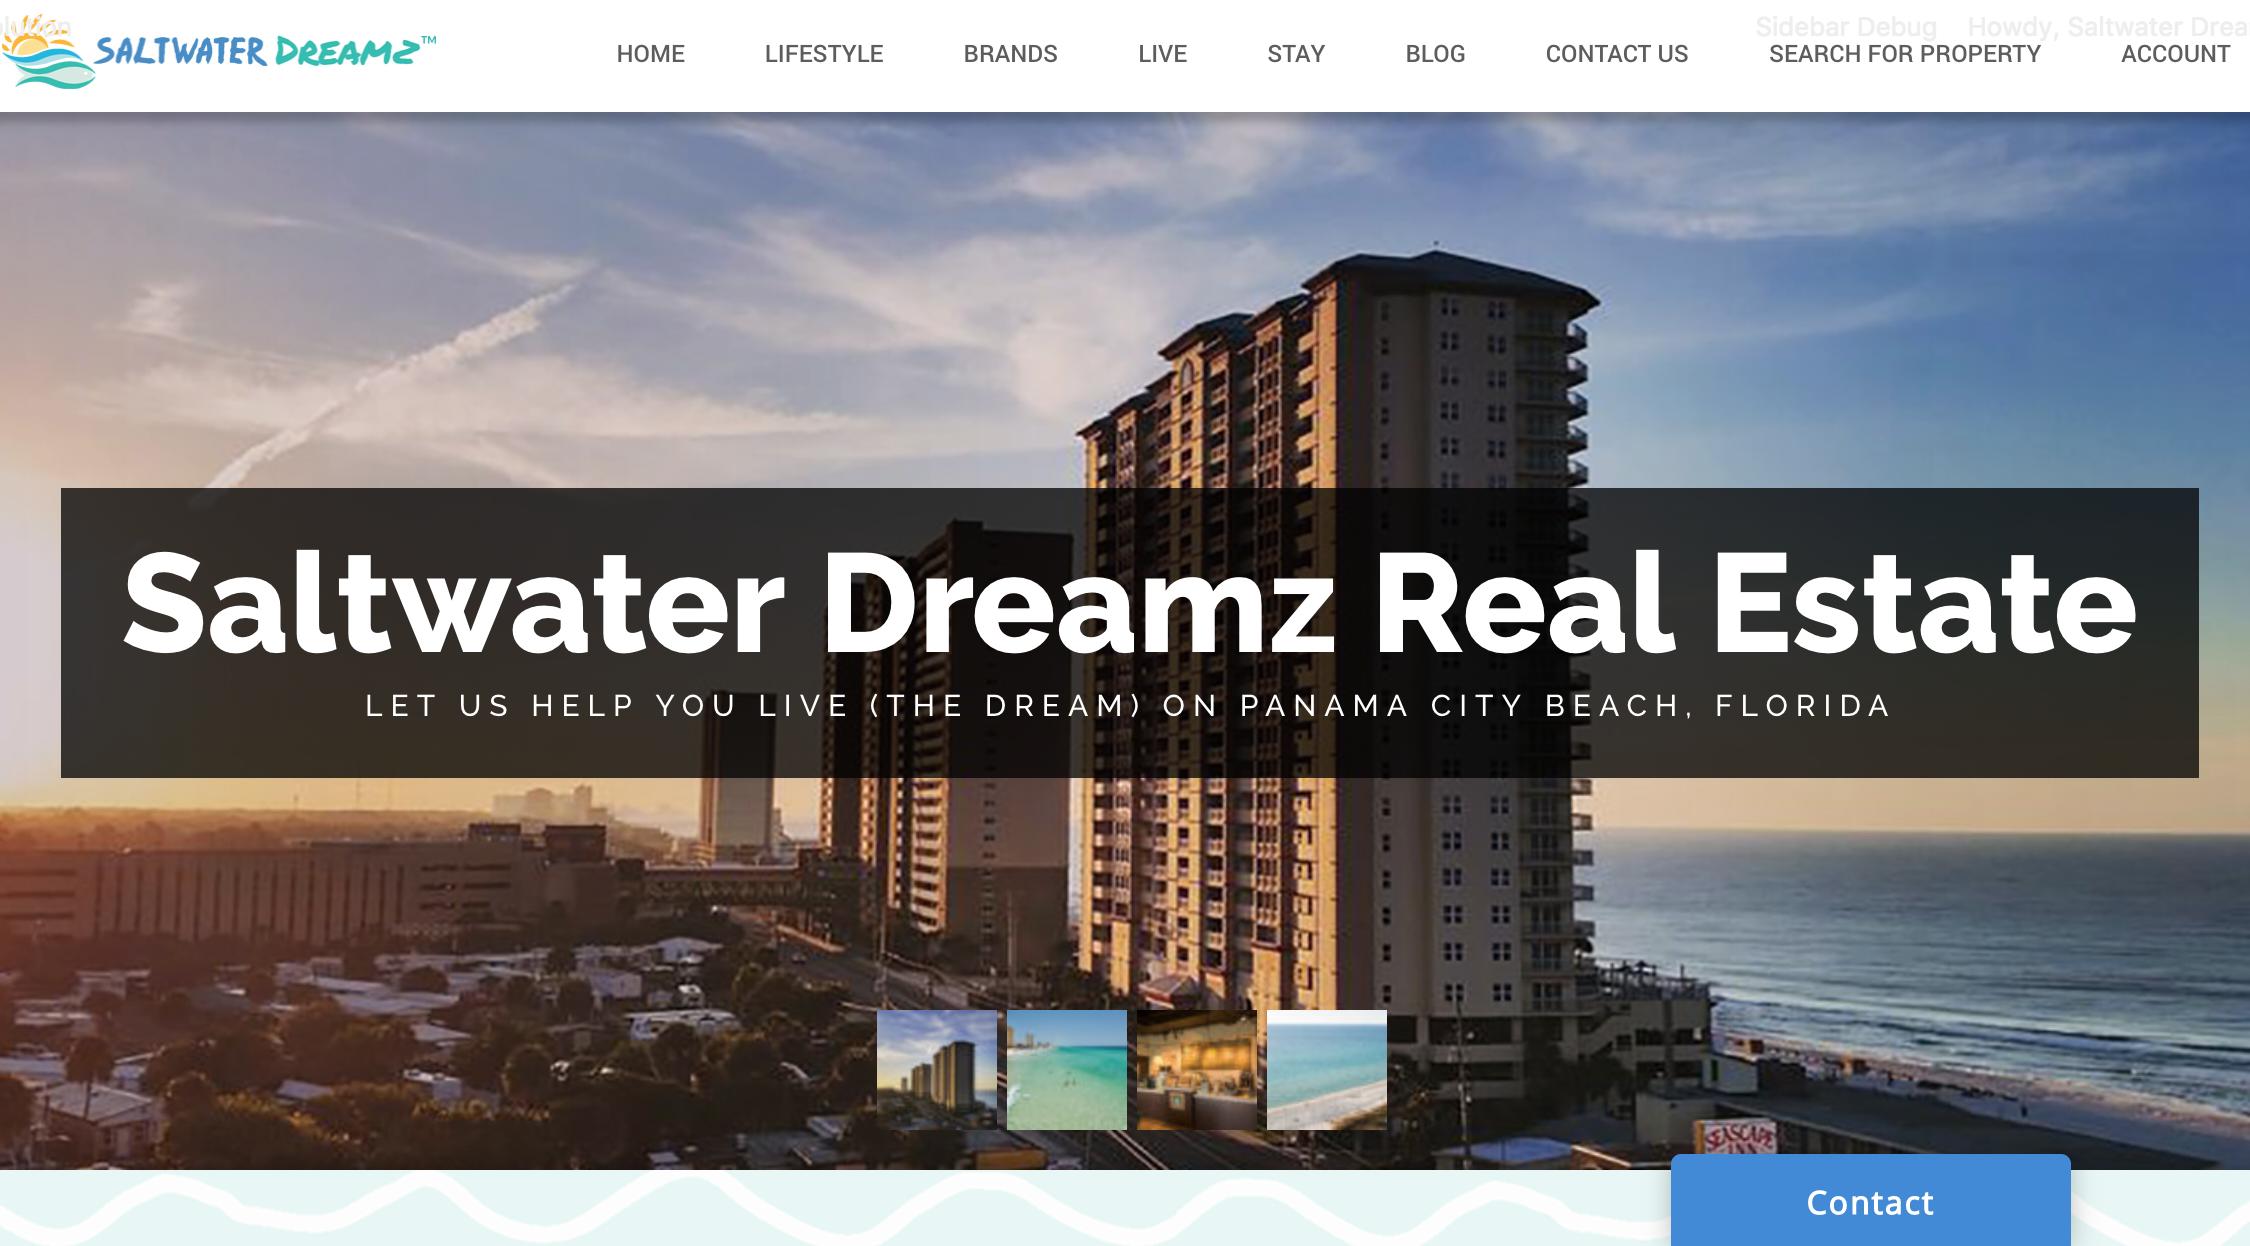 Saltwater Dreamz Featured Image